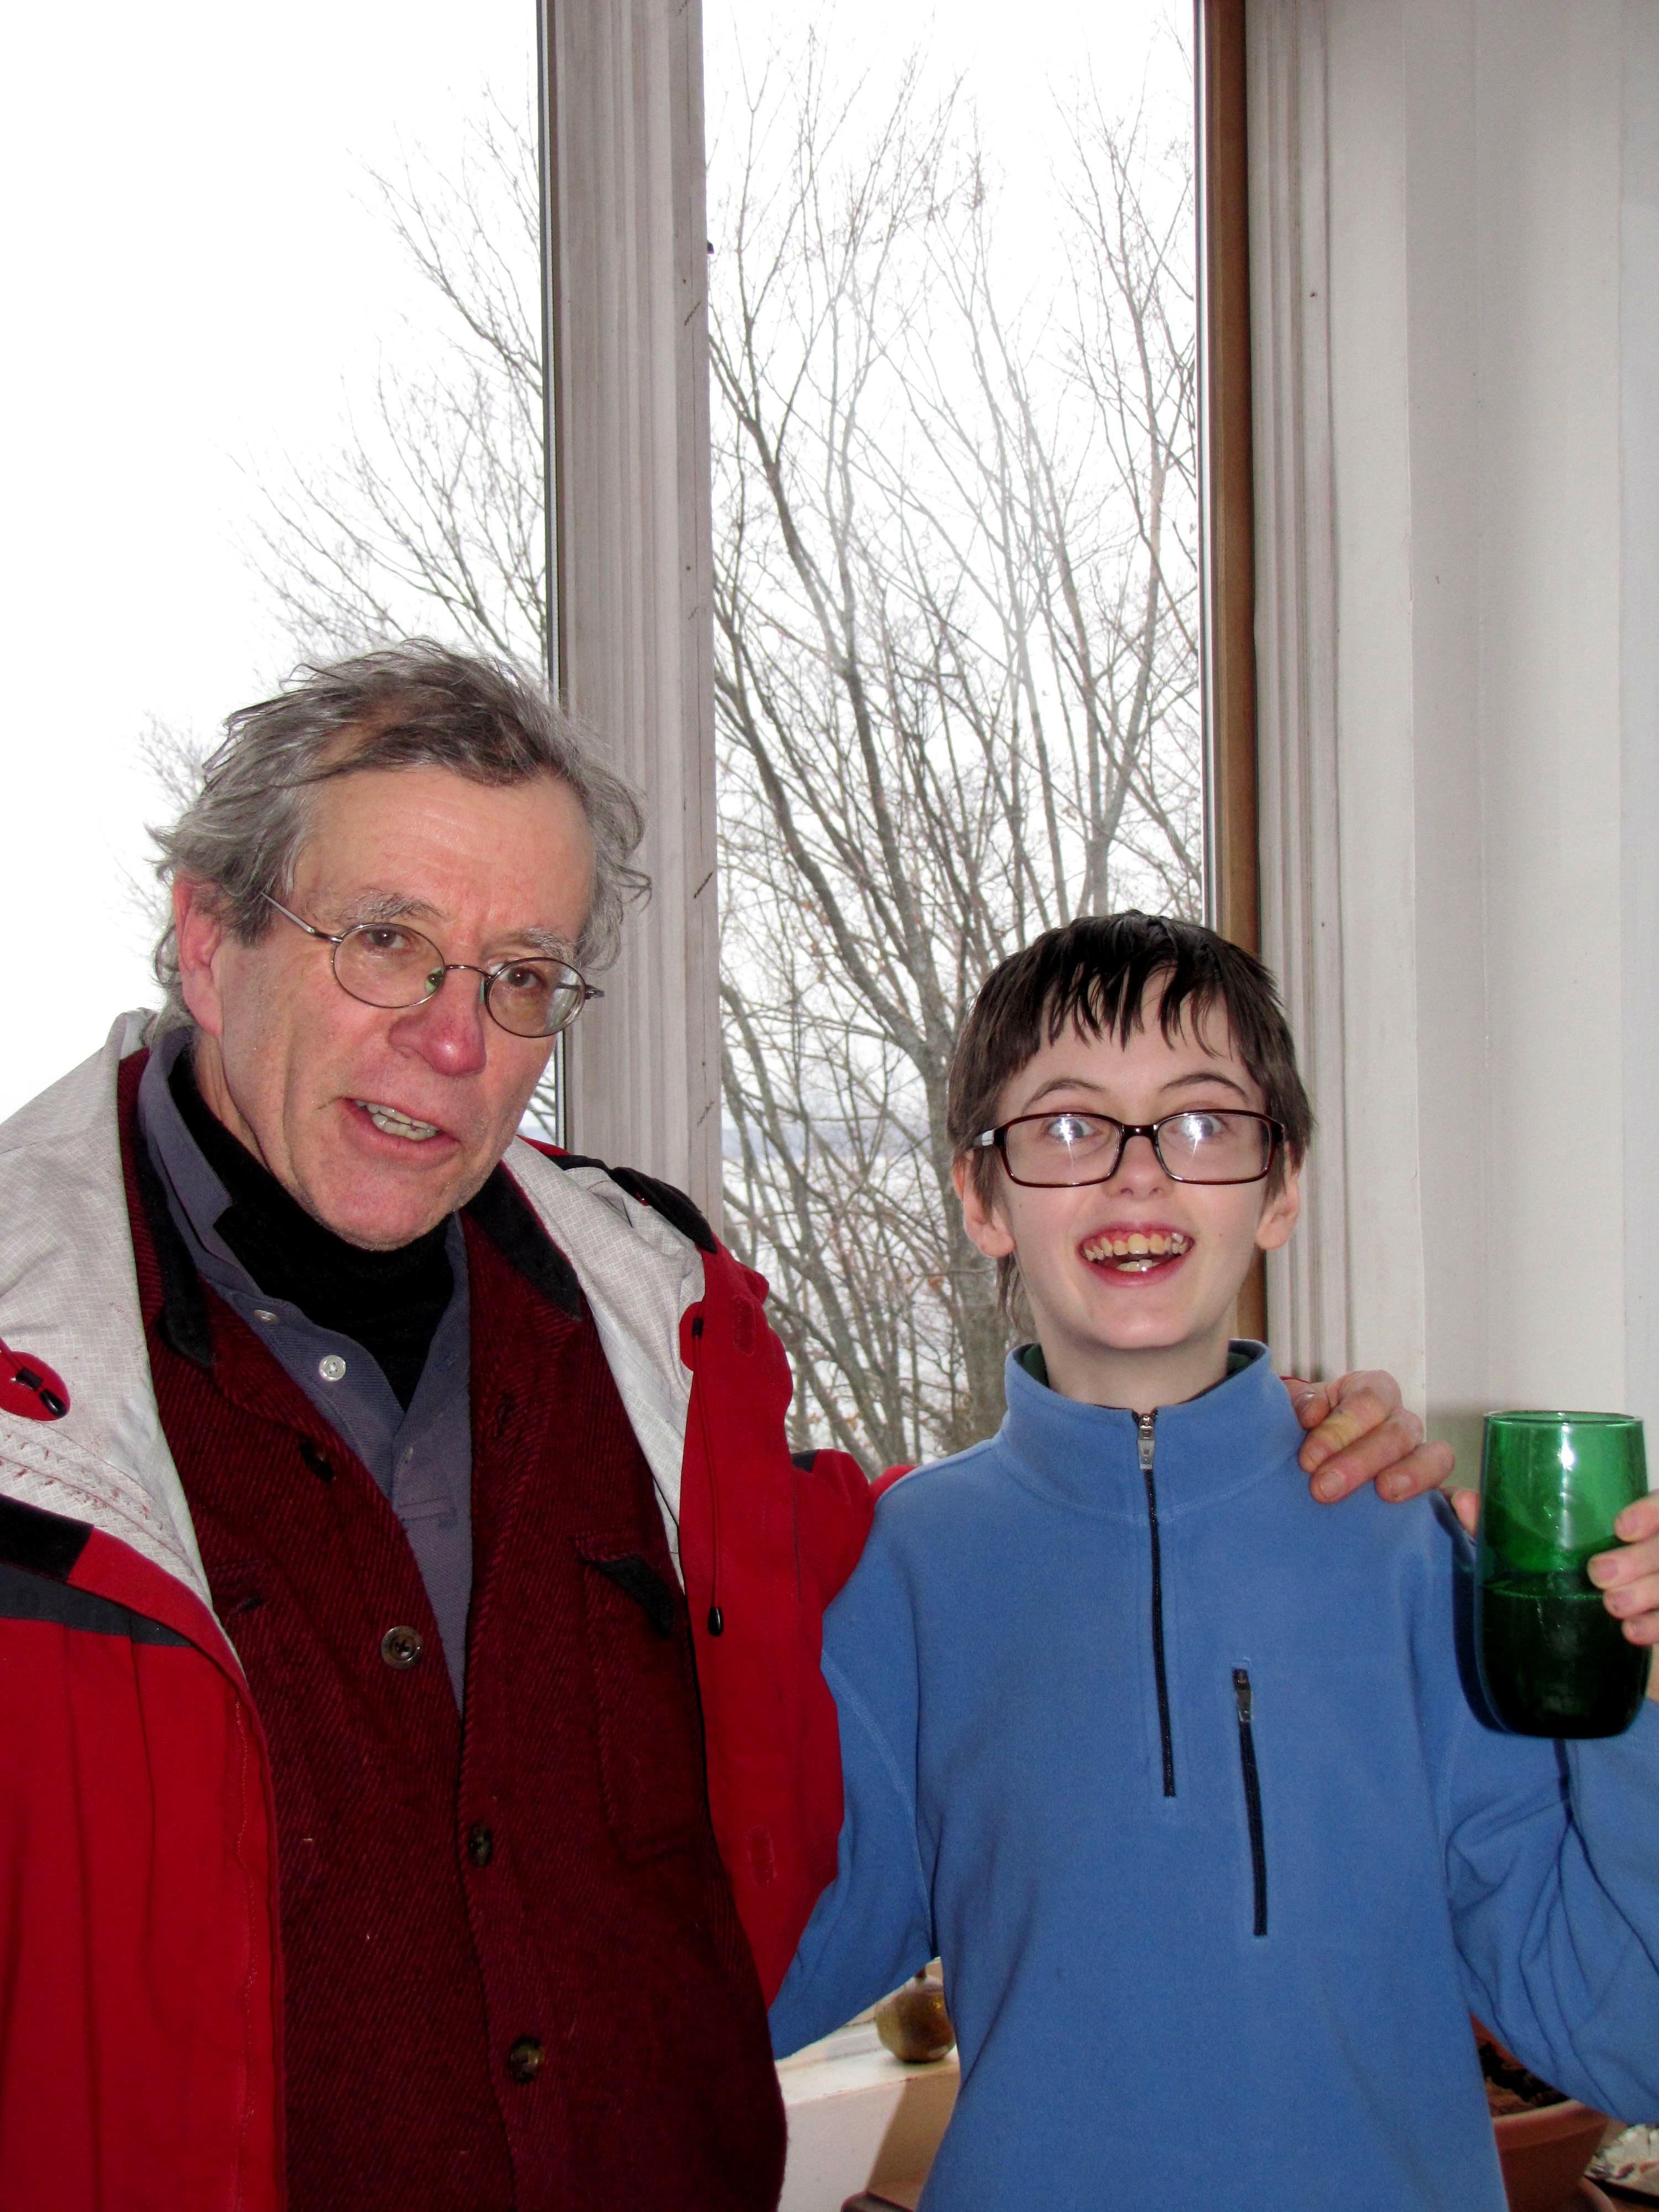 David Thomas Train and Peter Hartwell